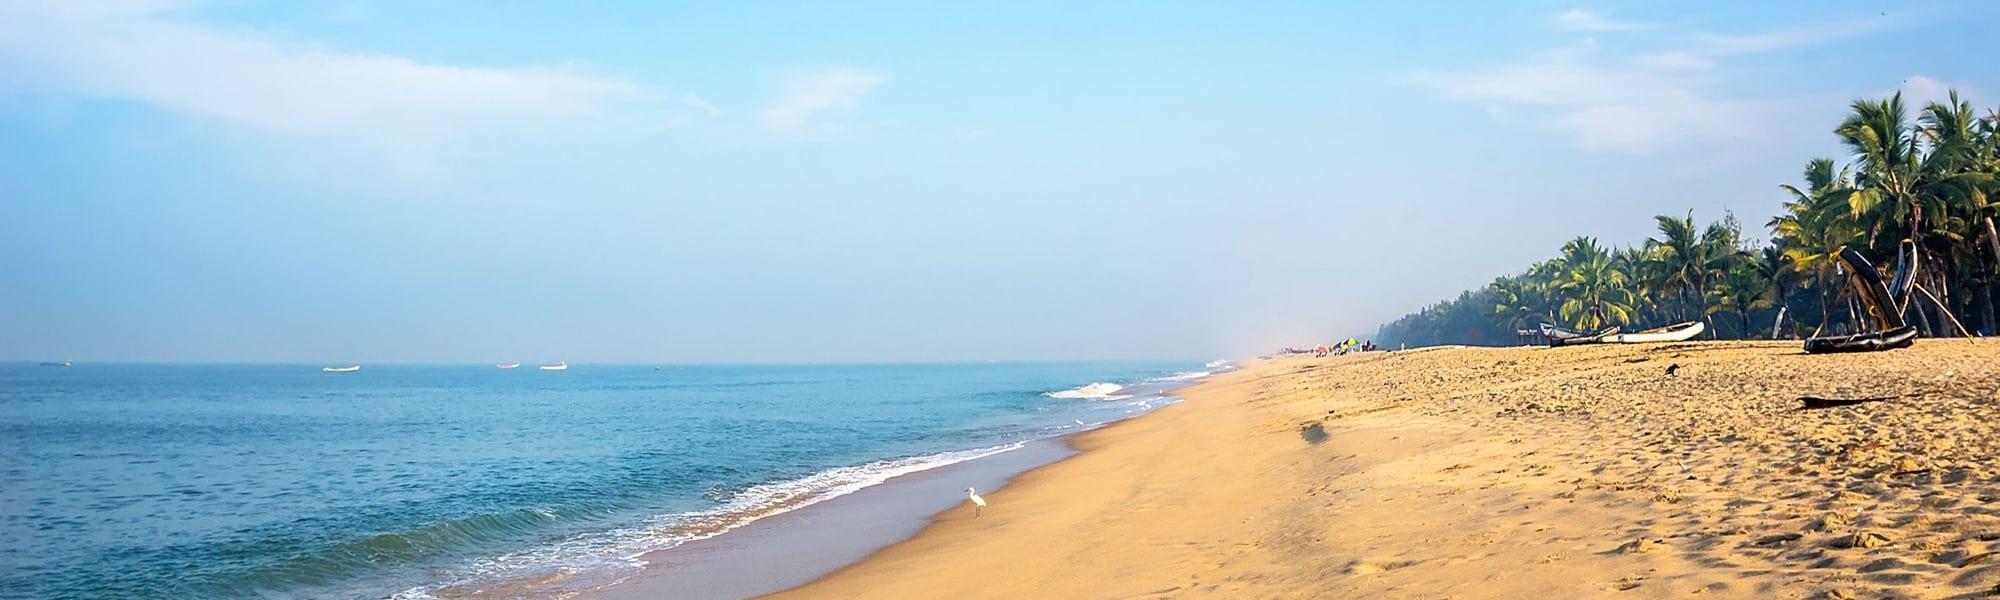 Take a Beach Break in Mararikulam